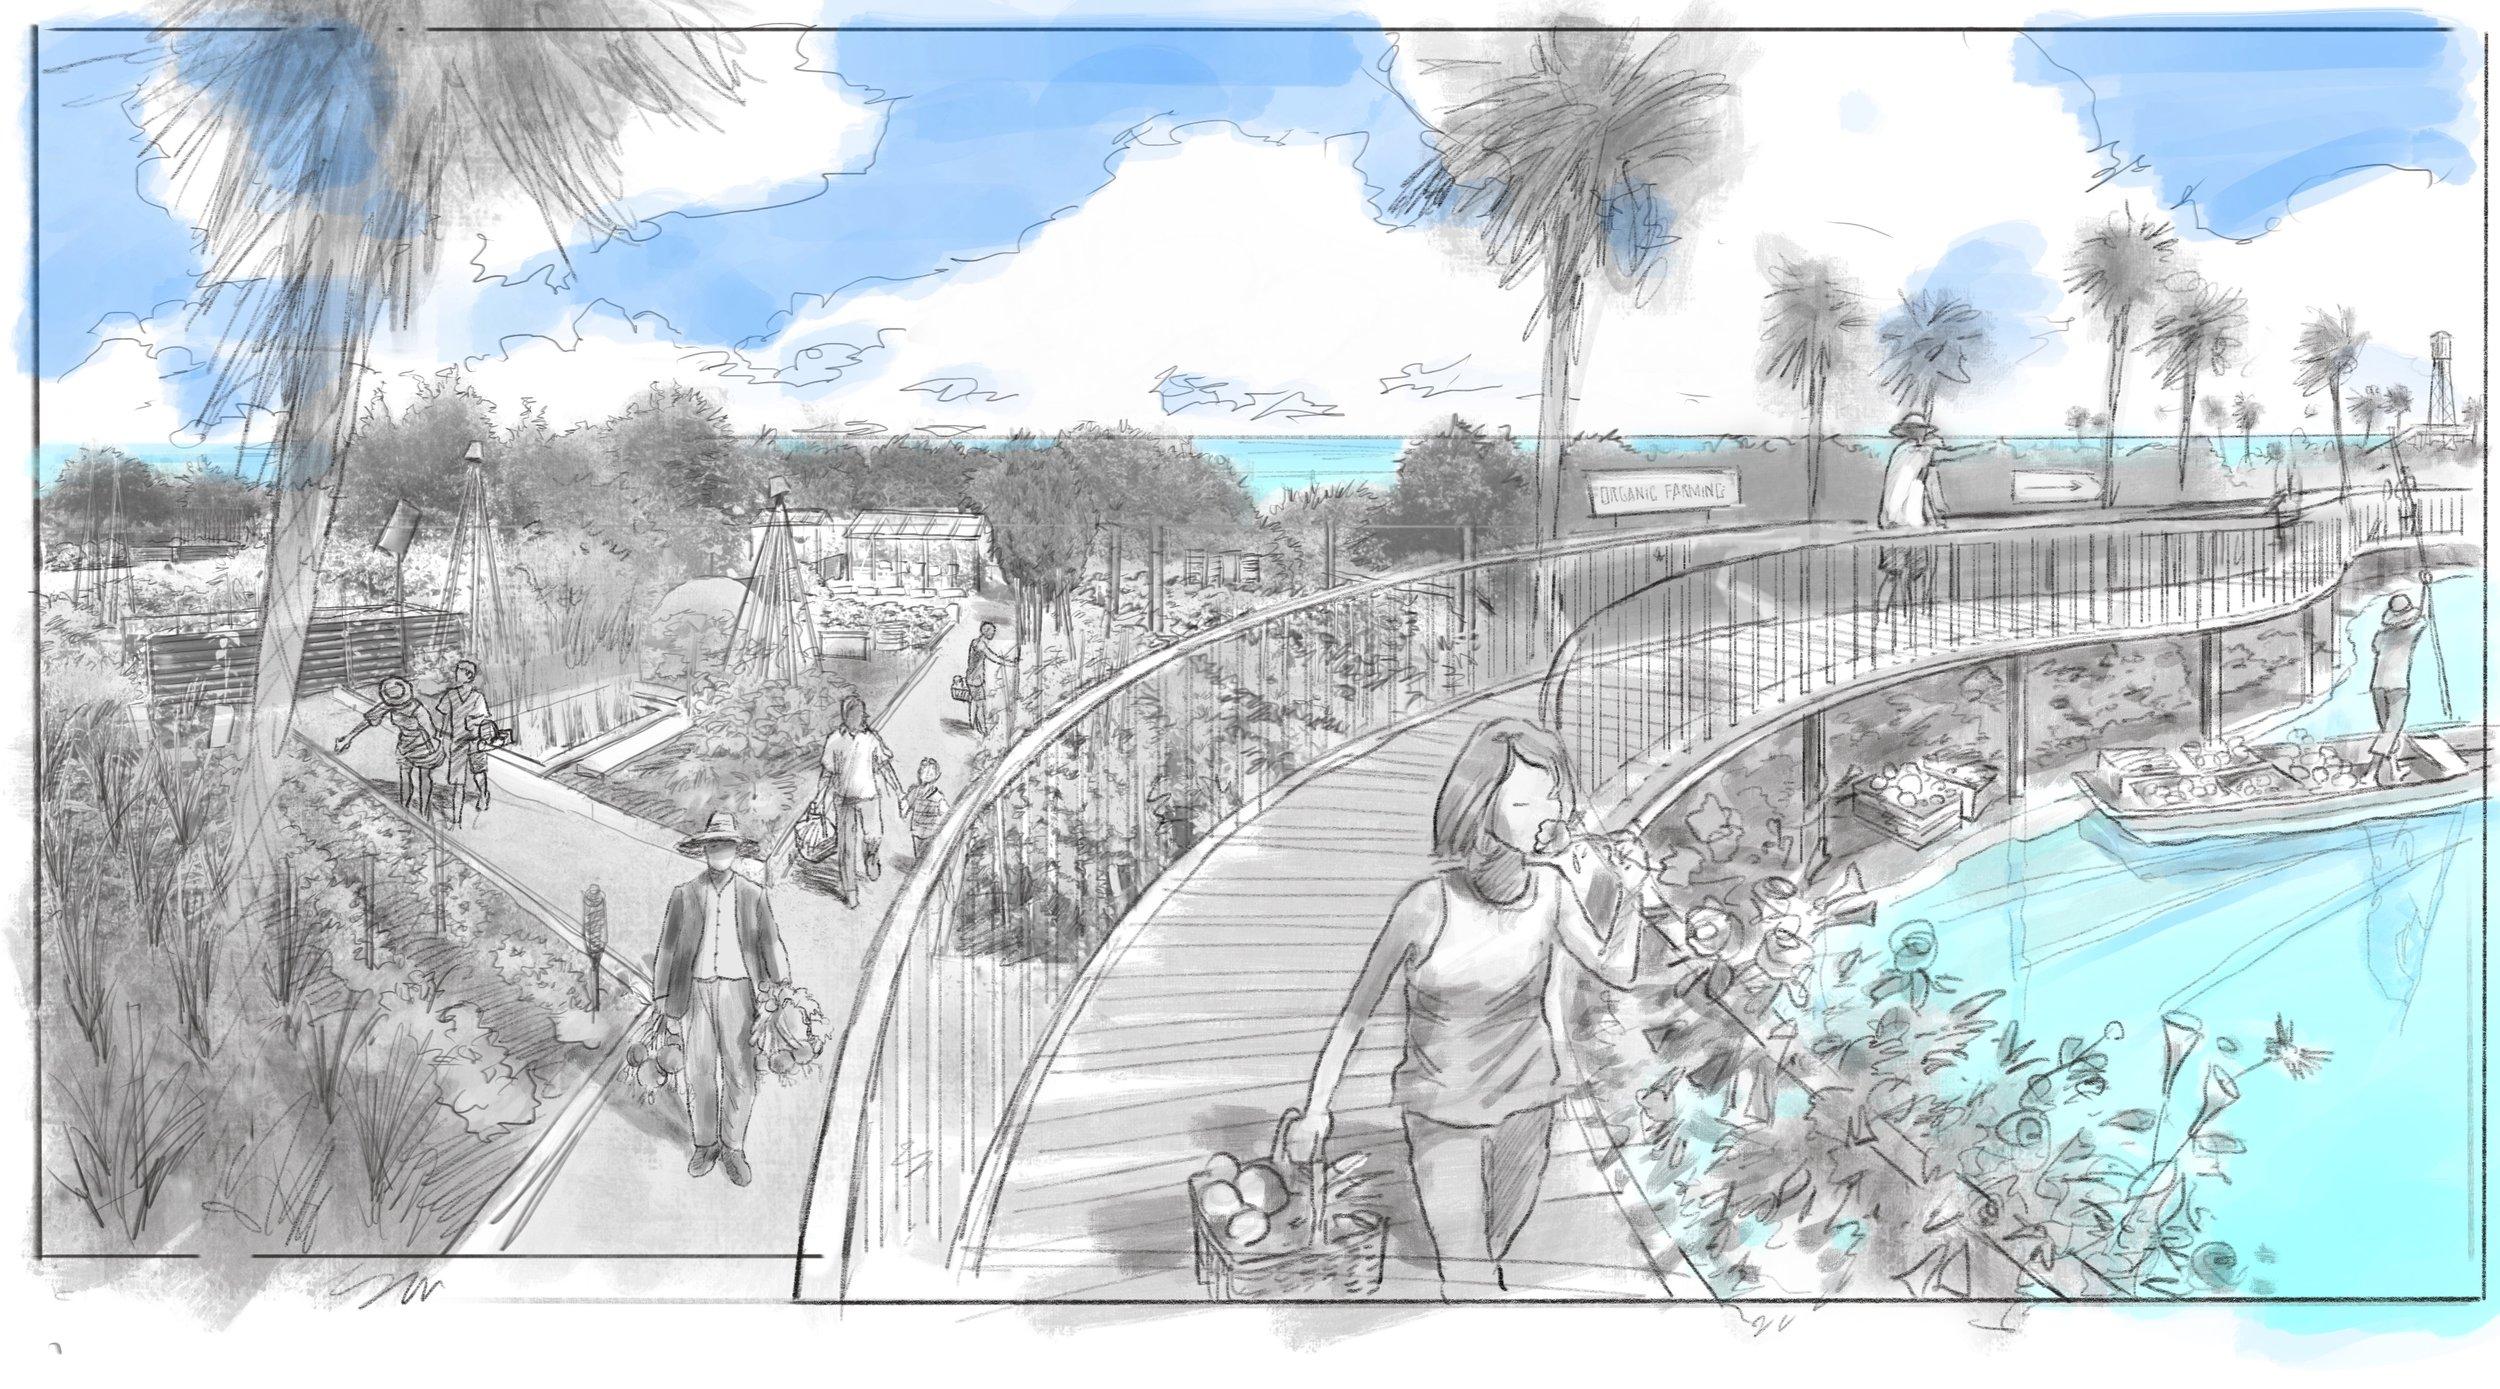 Farm_Boardwalk 2.jpg